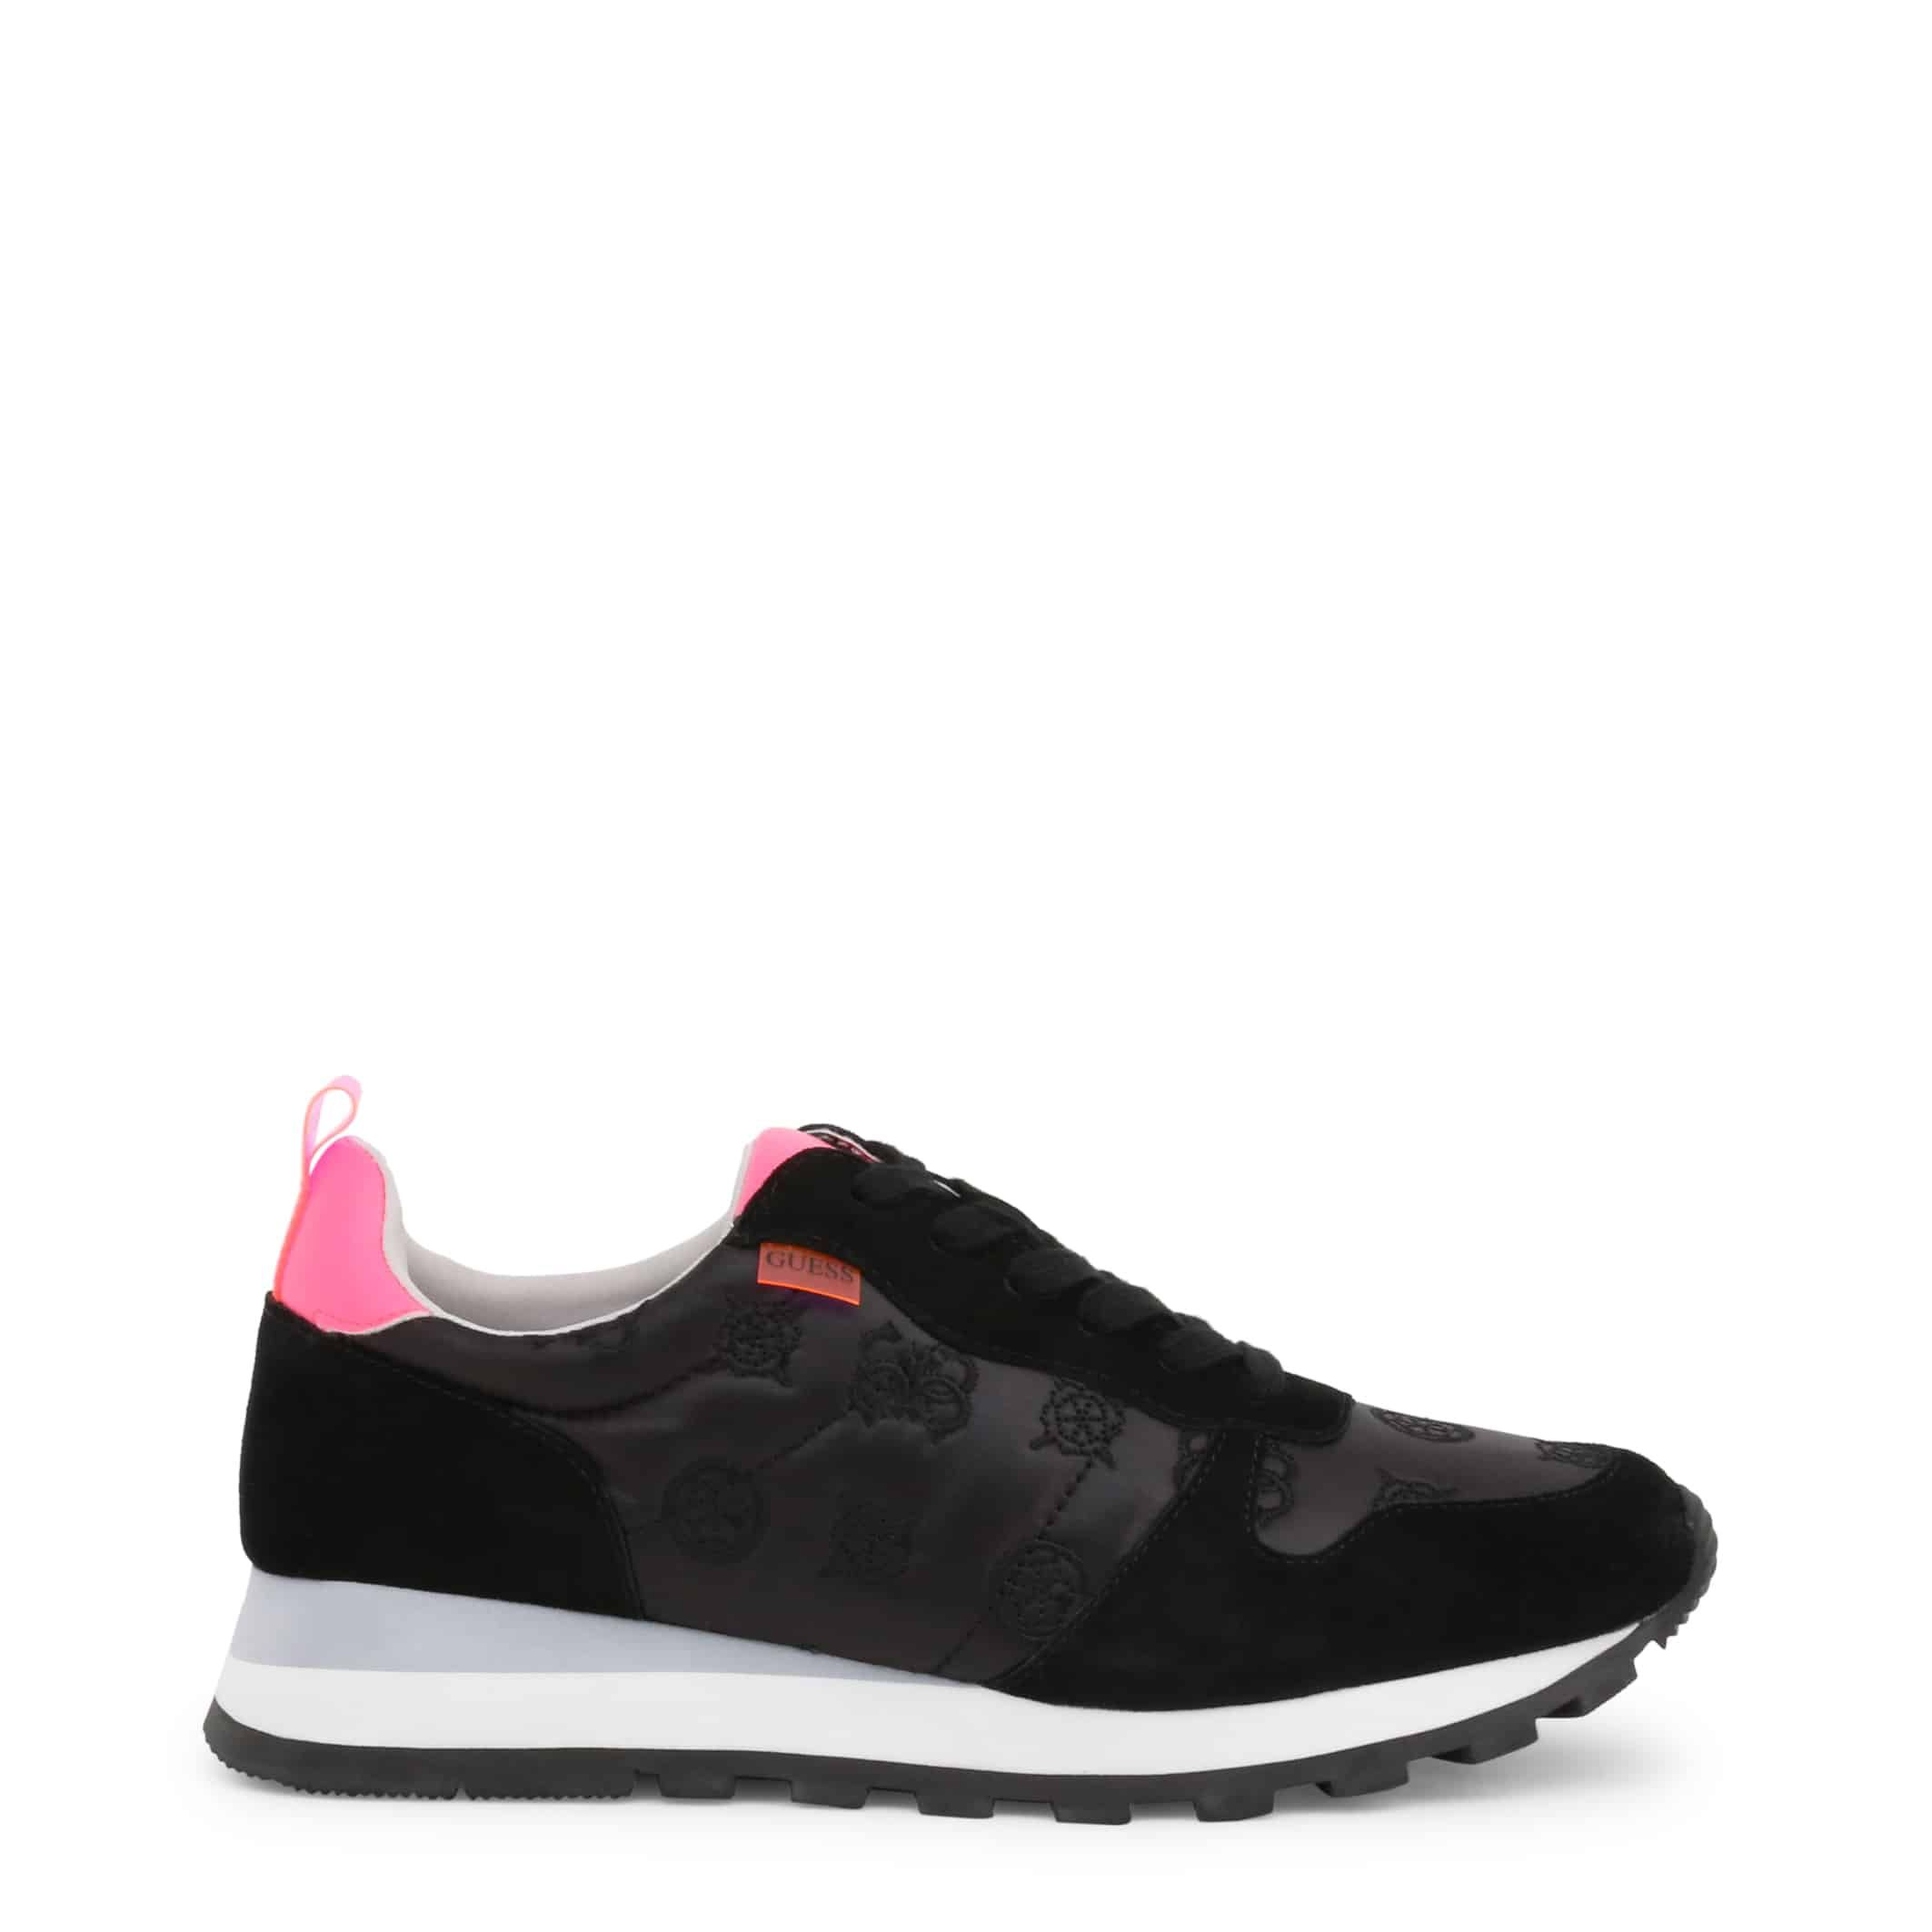 Schuhe U.S. Polo Assn. – AIACE4145S0_HN1 – Rosa